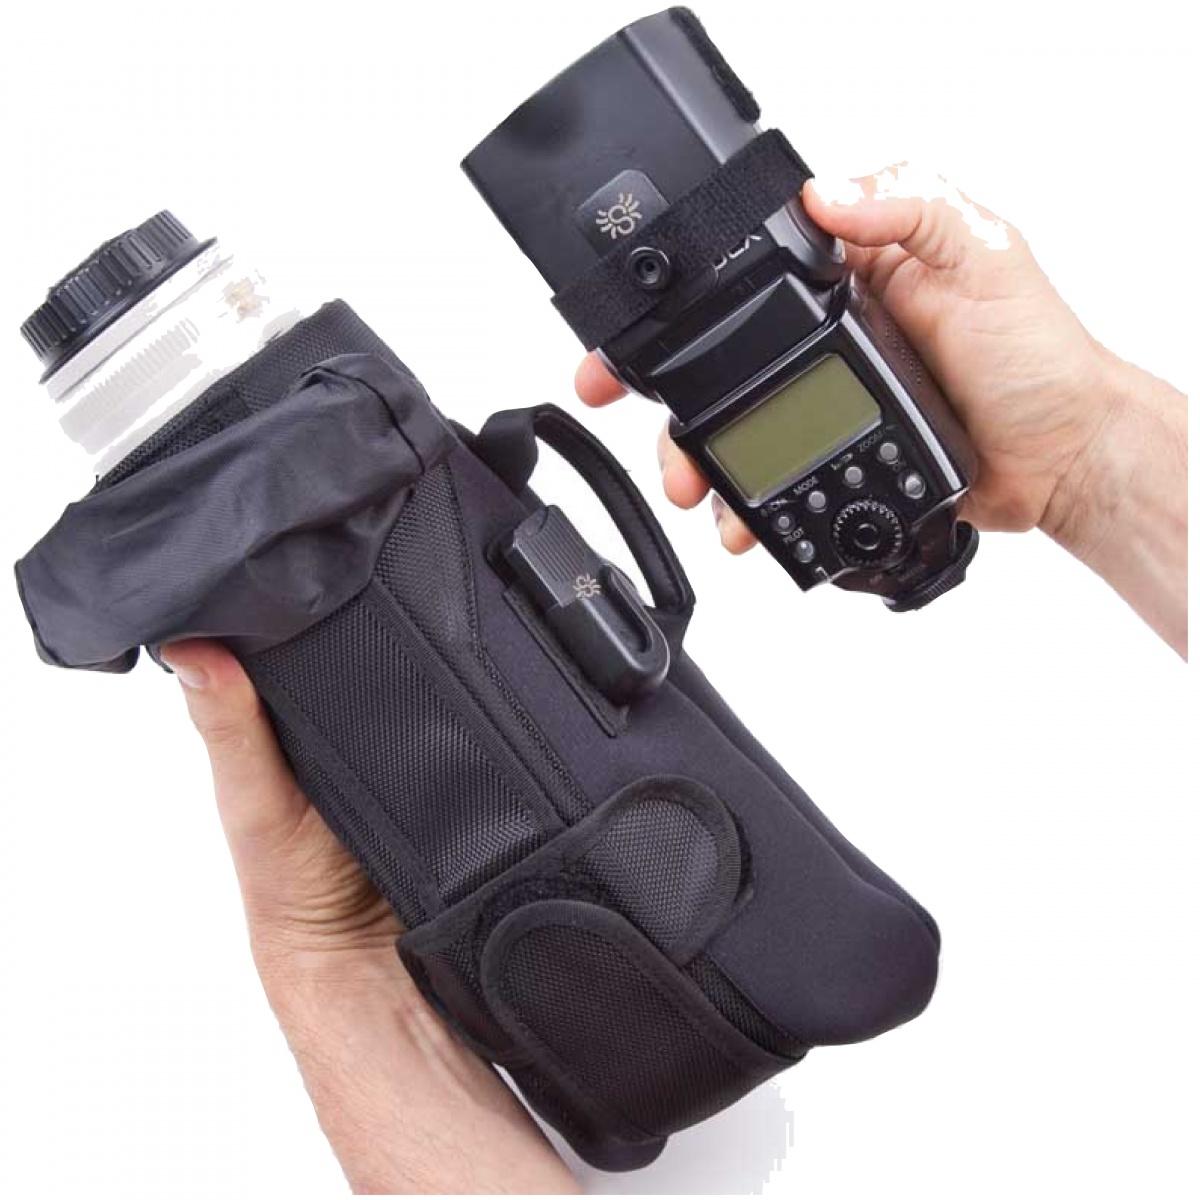 Spider Pro Lens Pouch Large